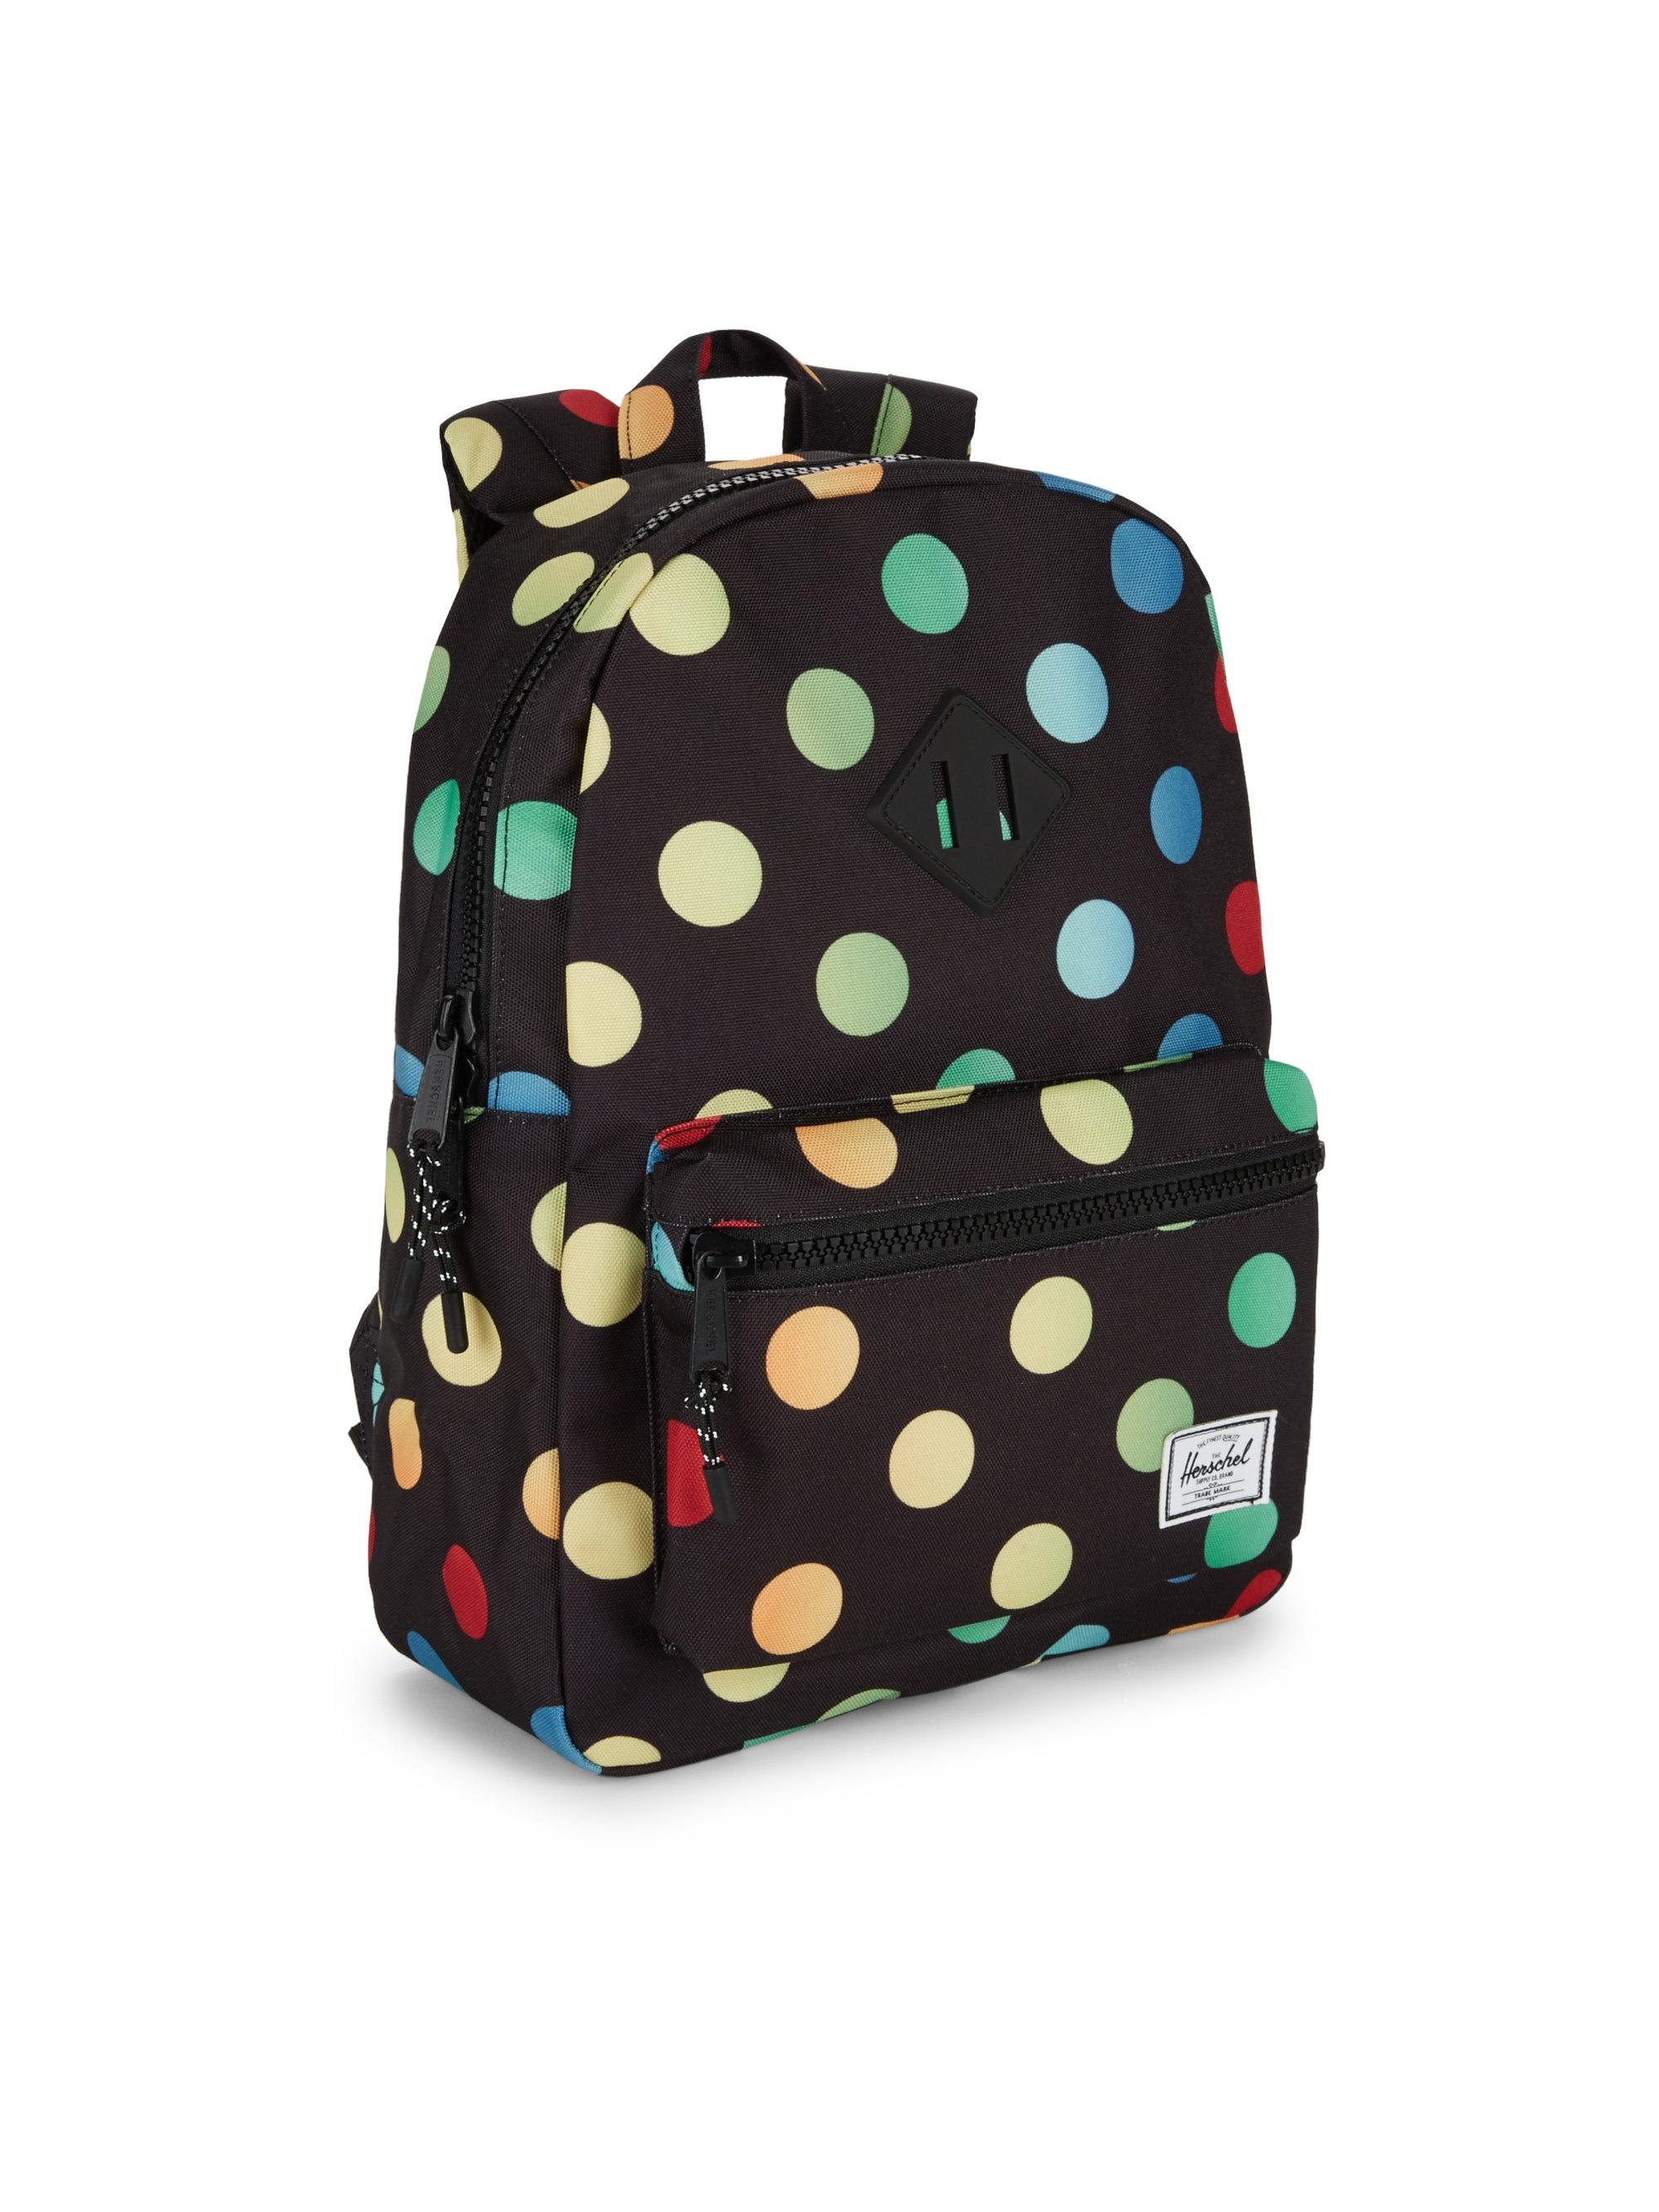 Herschel Supply Co. Kid s Heritage Youth Polkadot Backpack in Black ... 5b968264b1131